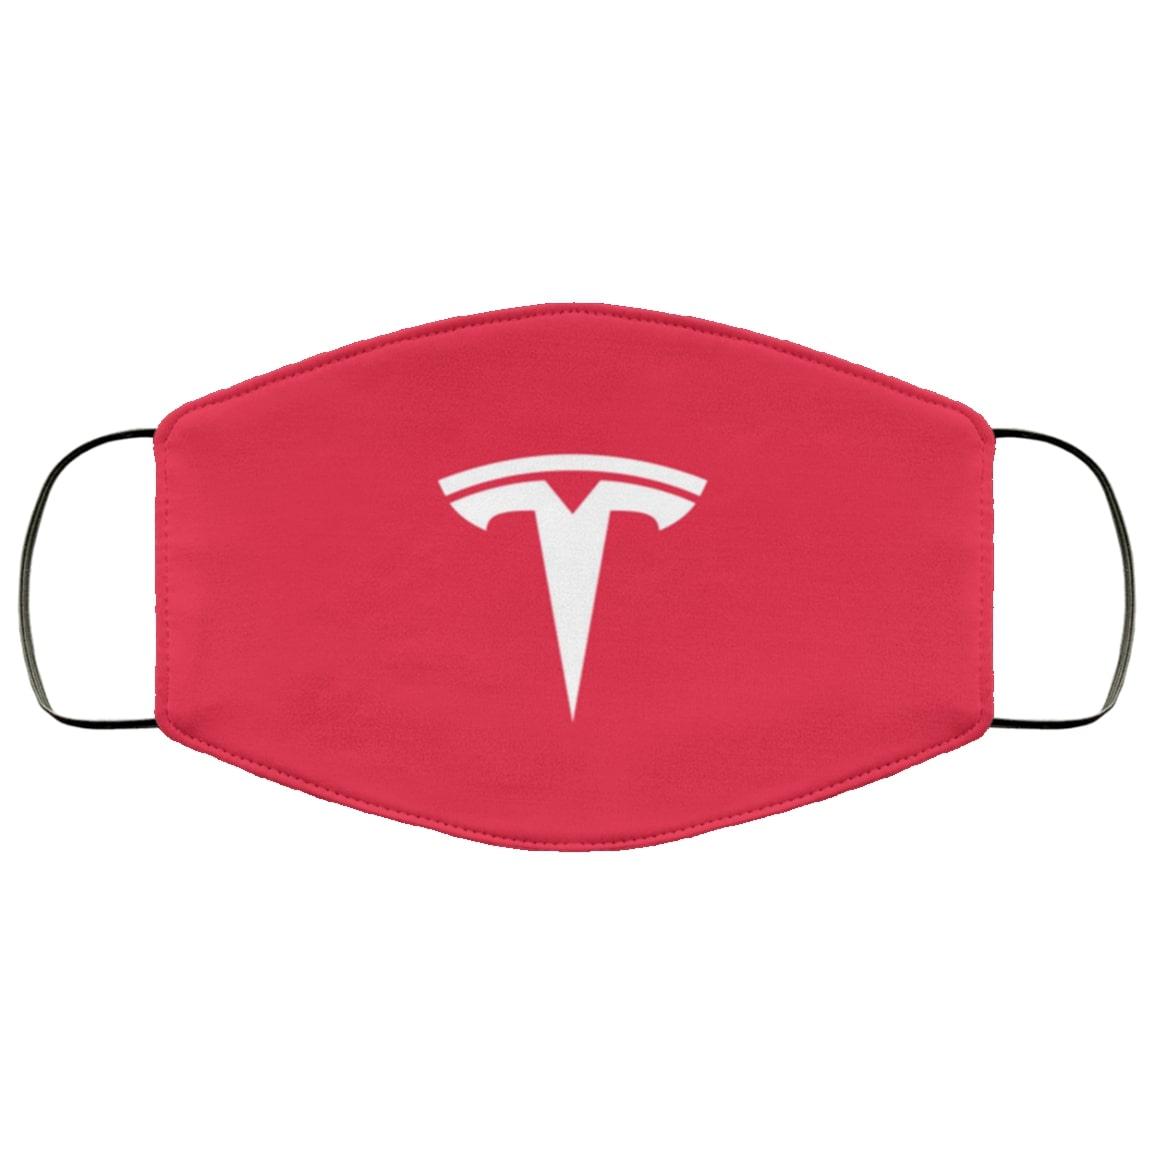 Tesla motors full over printed face mask 2